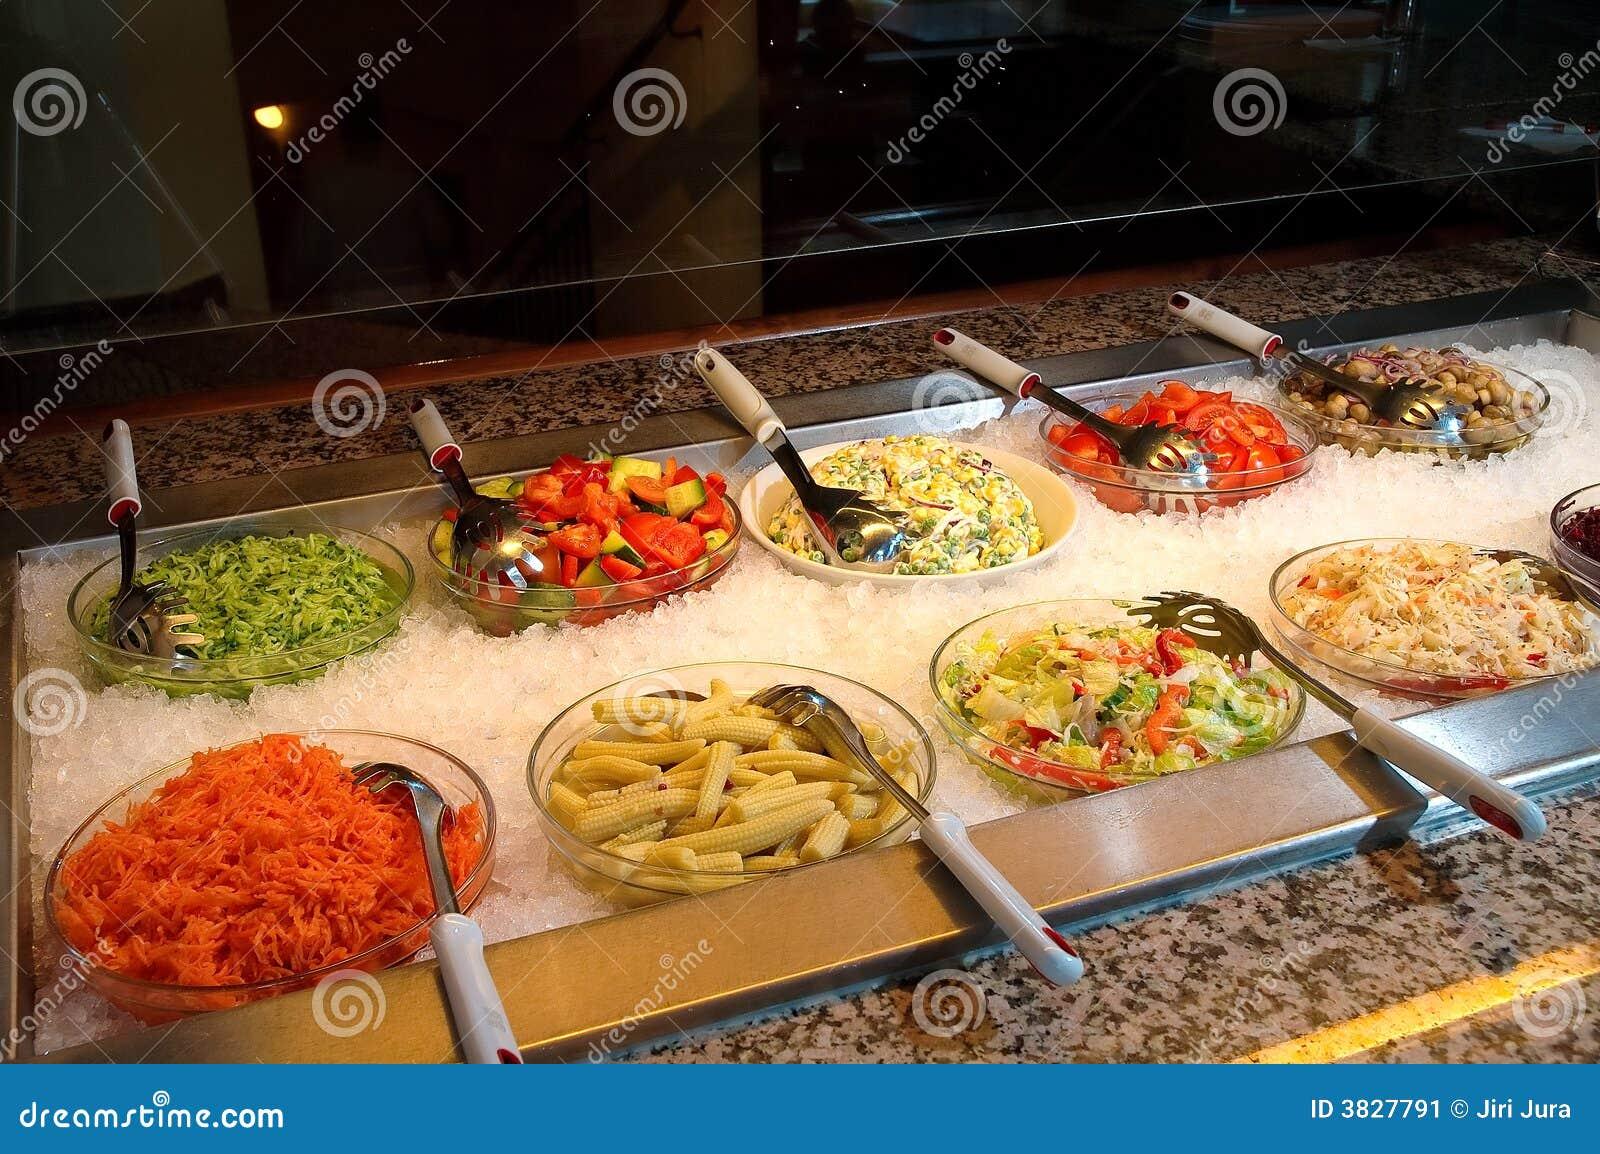 Vegetable fresh restaurant food stock image image of for Food bar in restaurant